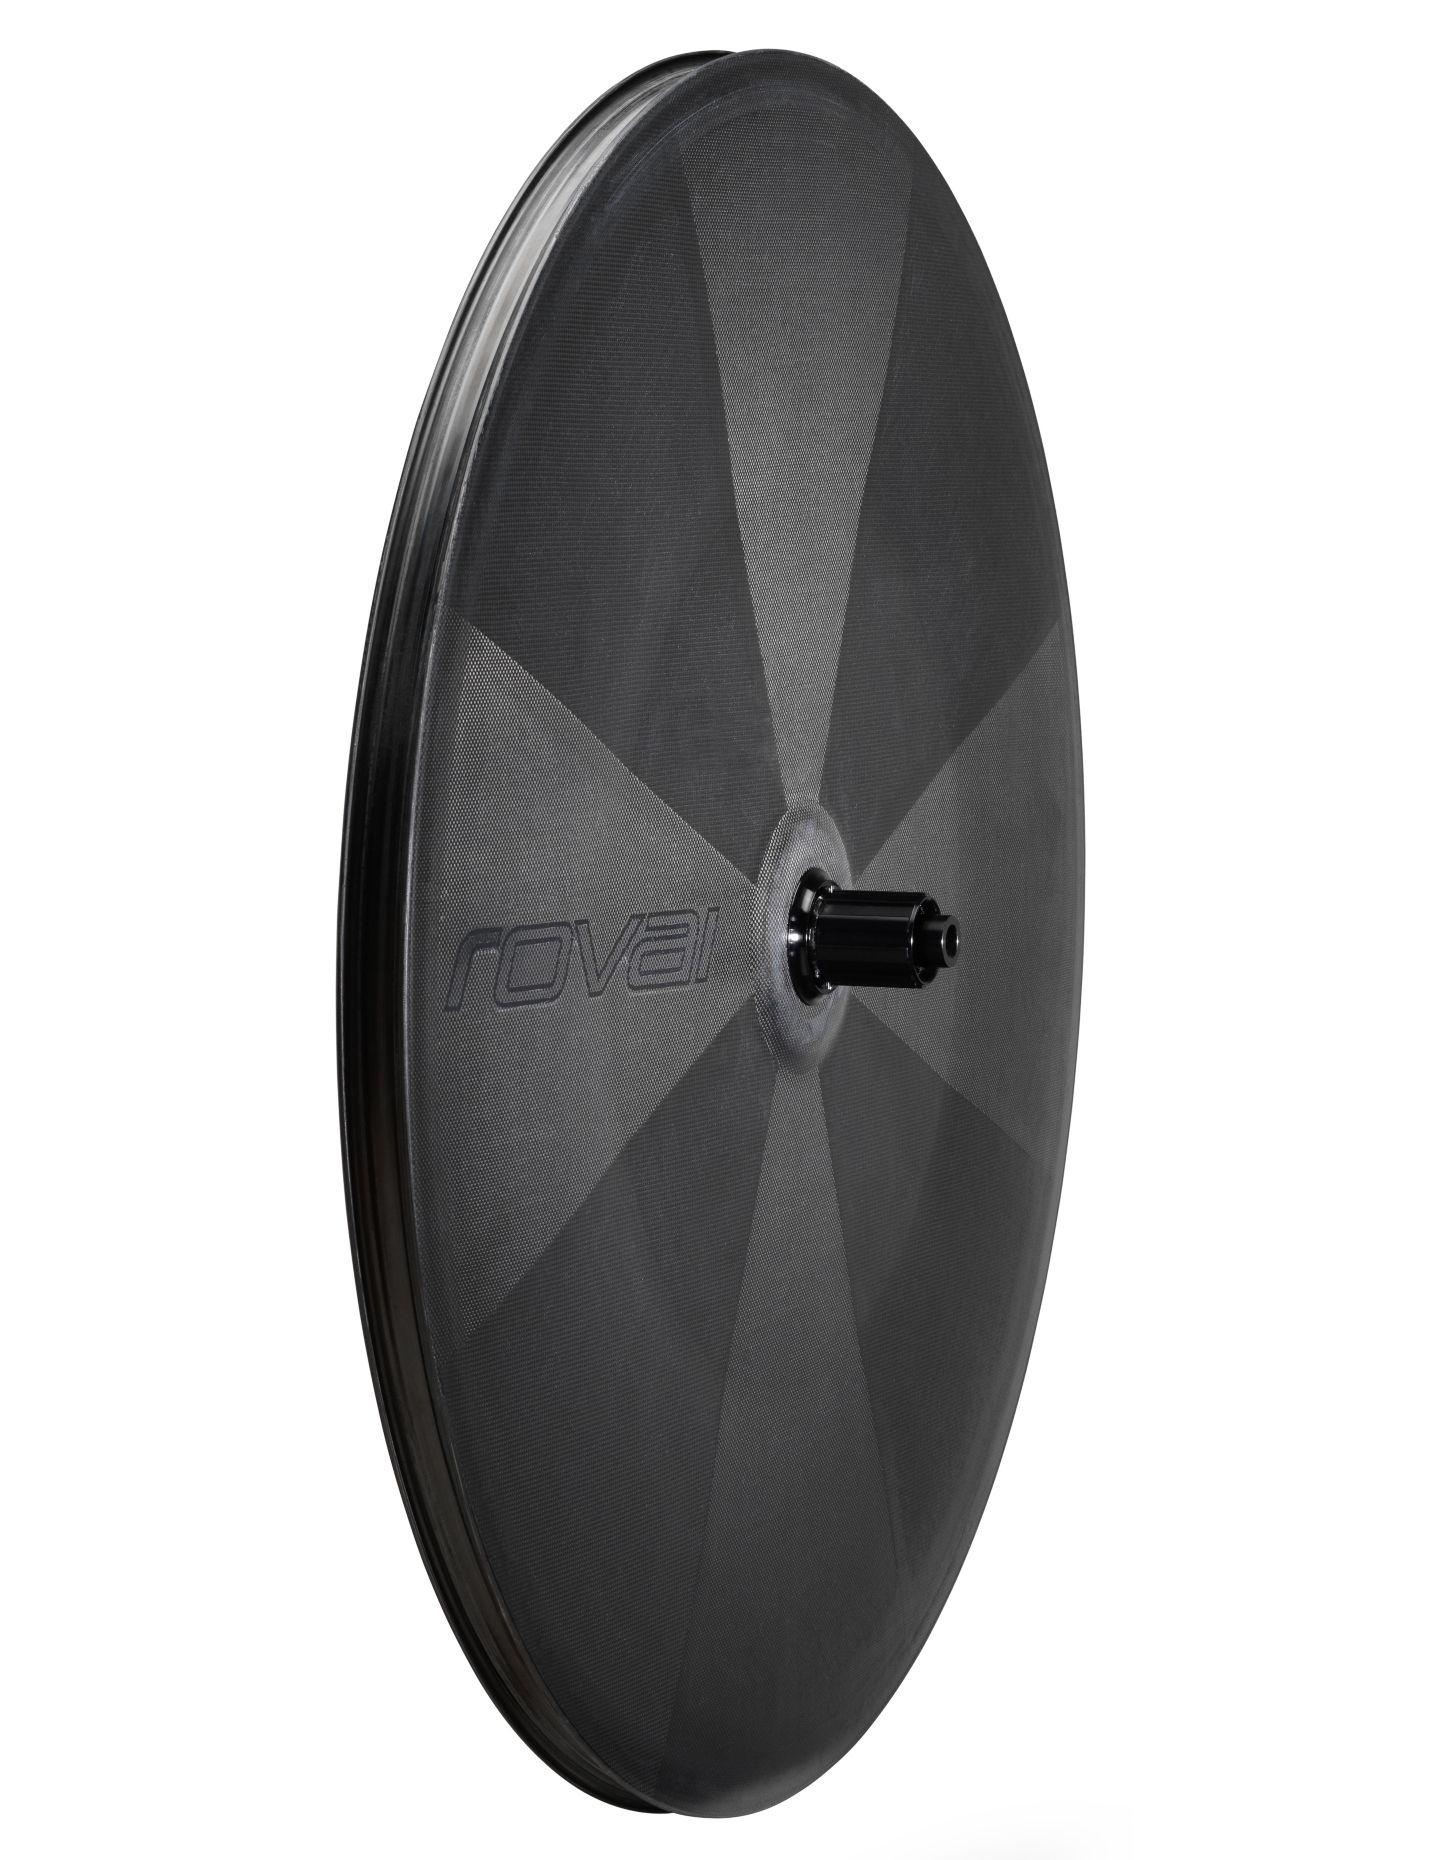 Roval 321 Disc Brake Disc Rear Wheel 2020 | Wheelset